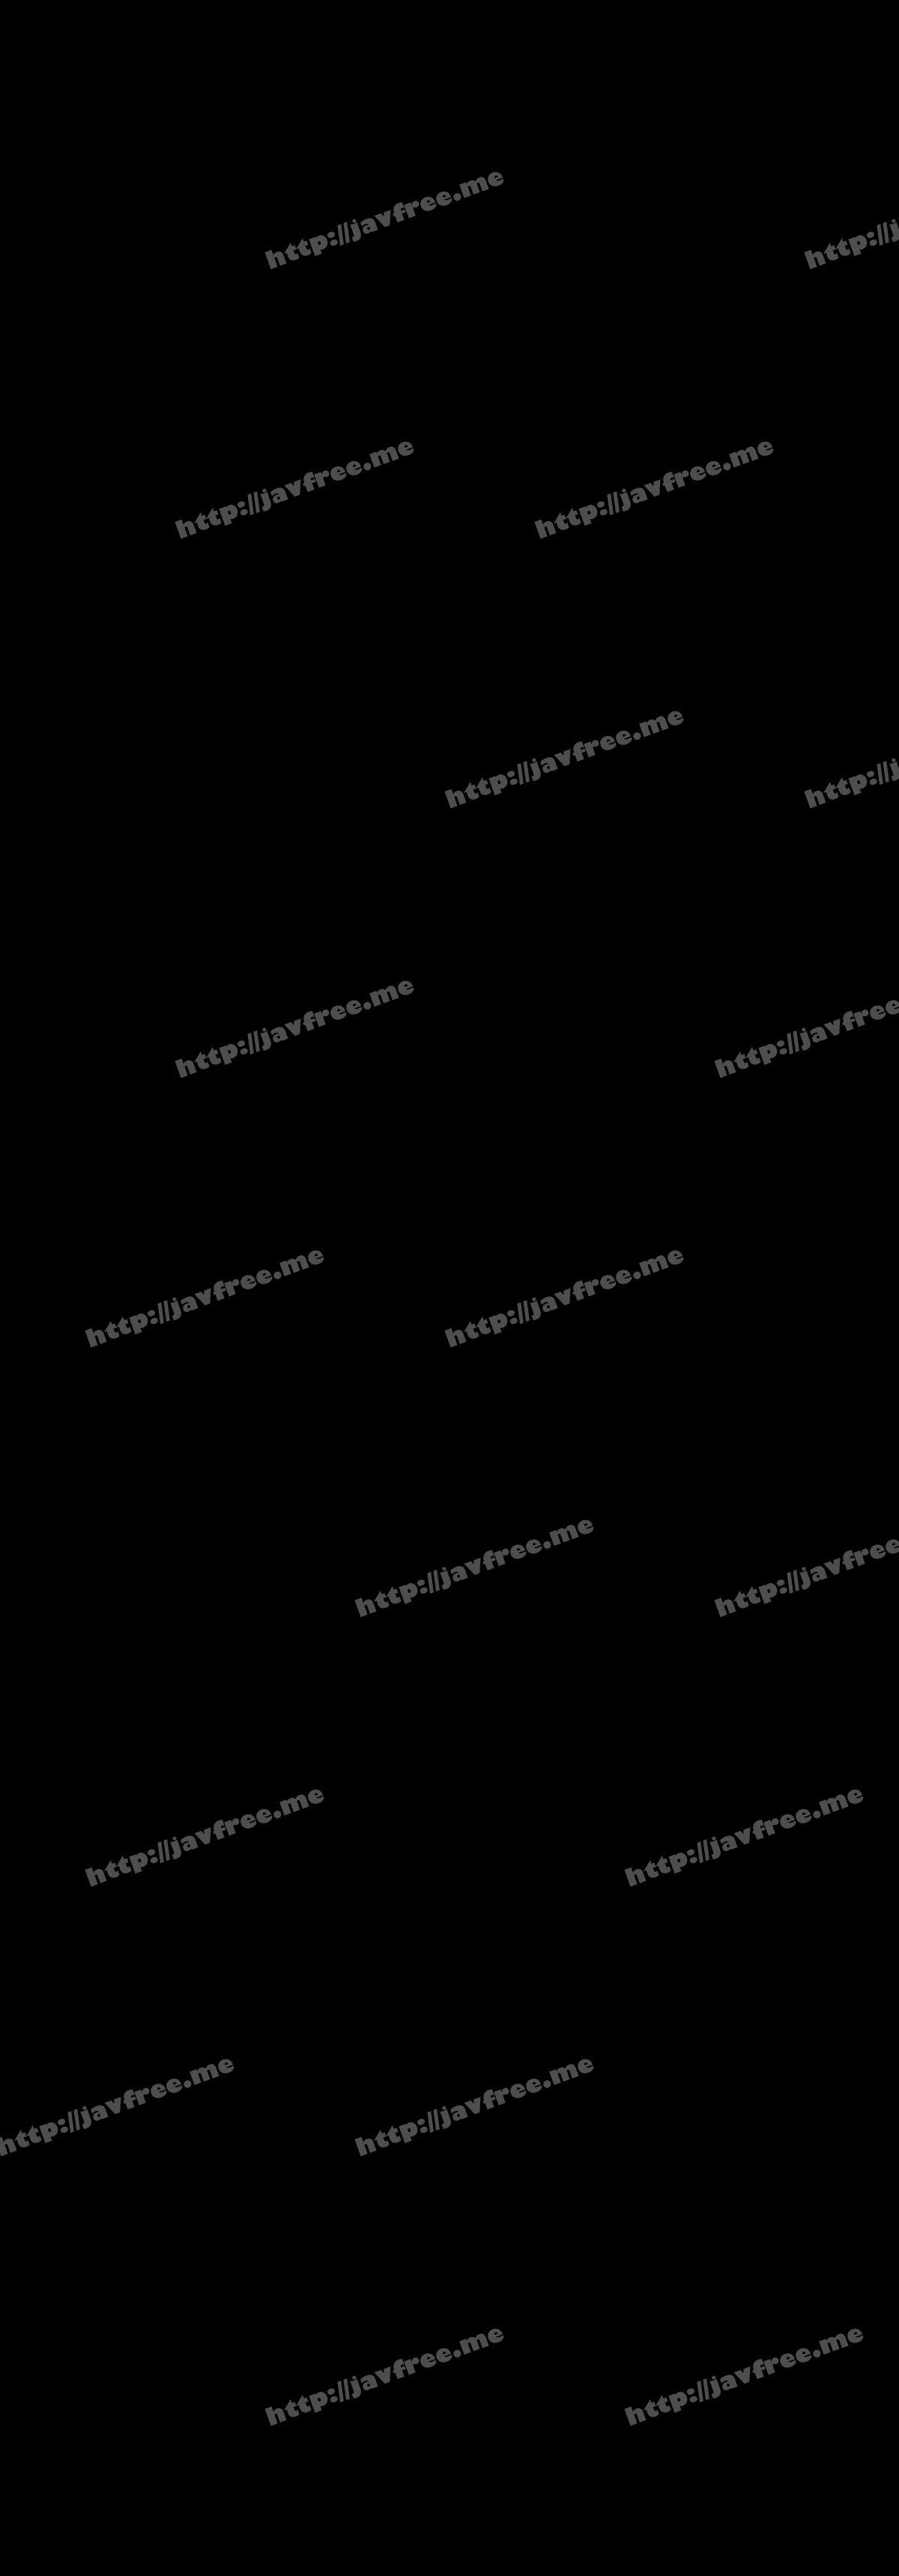 [HD][DBER-039] 断末魔の女体は奈落に沈む 轟沈鉄枷地獄 EPISODE-06:ついに拿捕された女幹部、人生最悪の拷虐昇天に哭く 一条綺美香 - image DBER-039-1080p on https://javfree.me